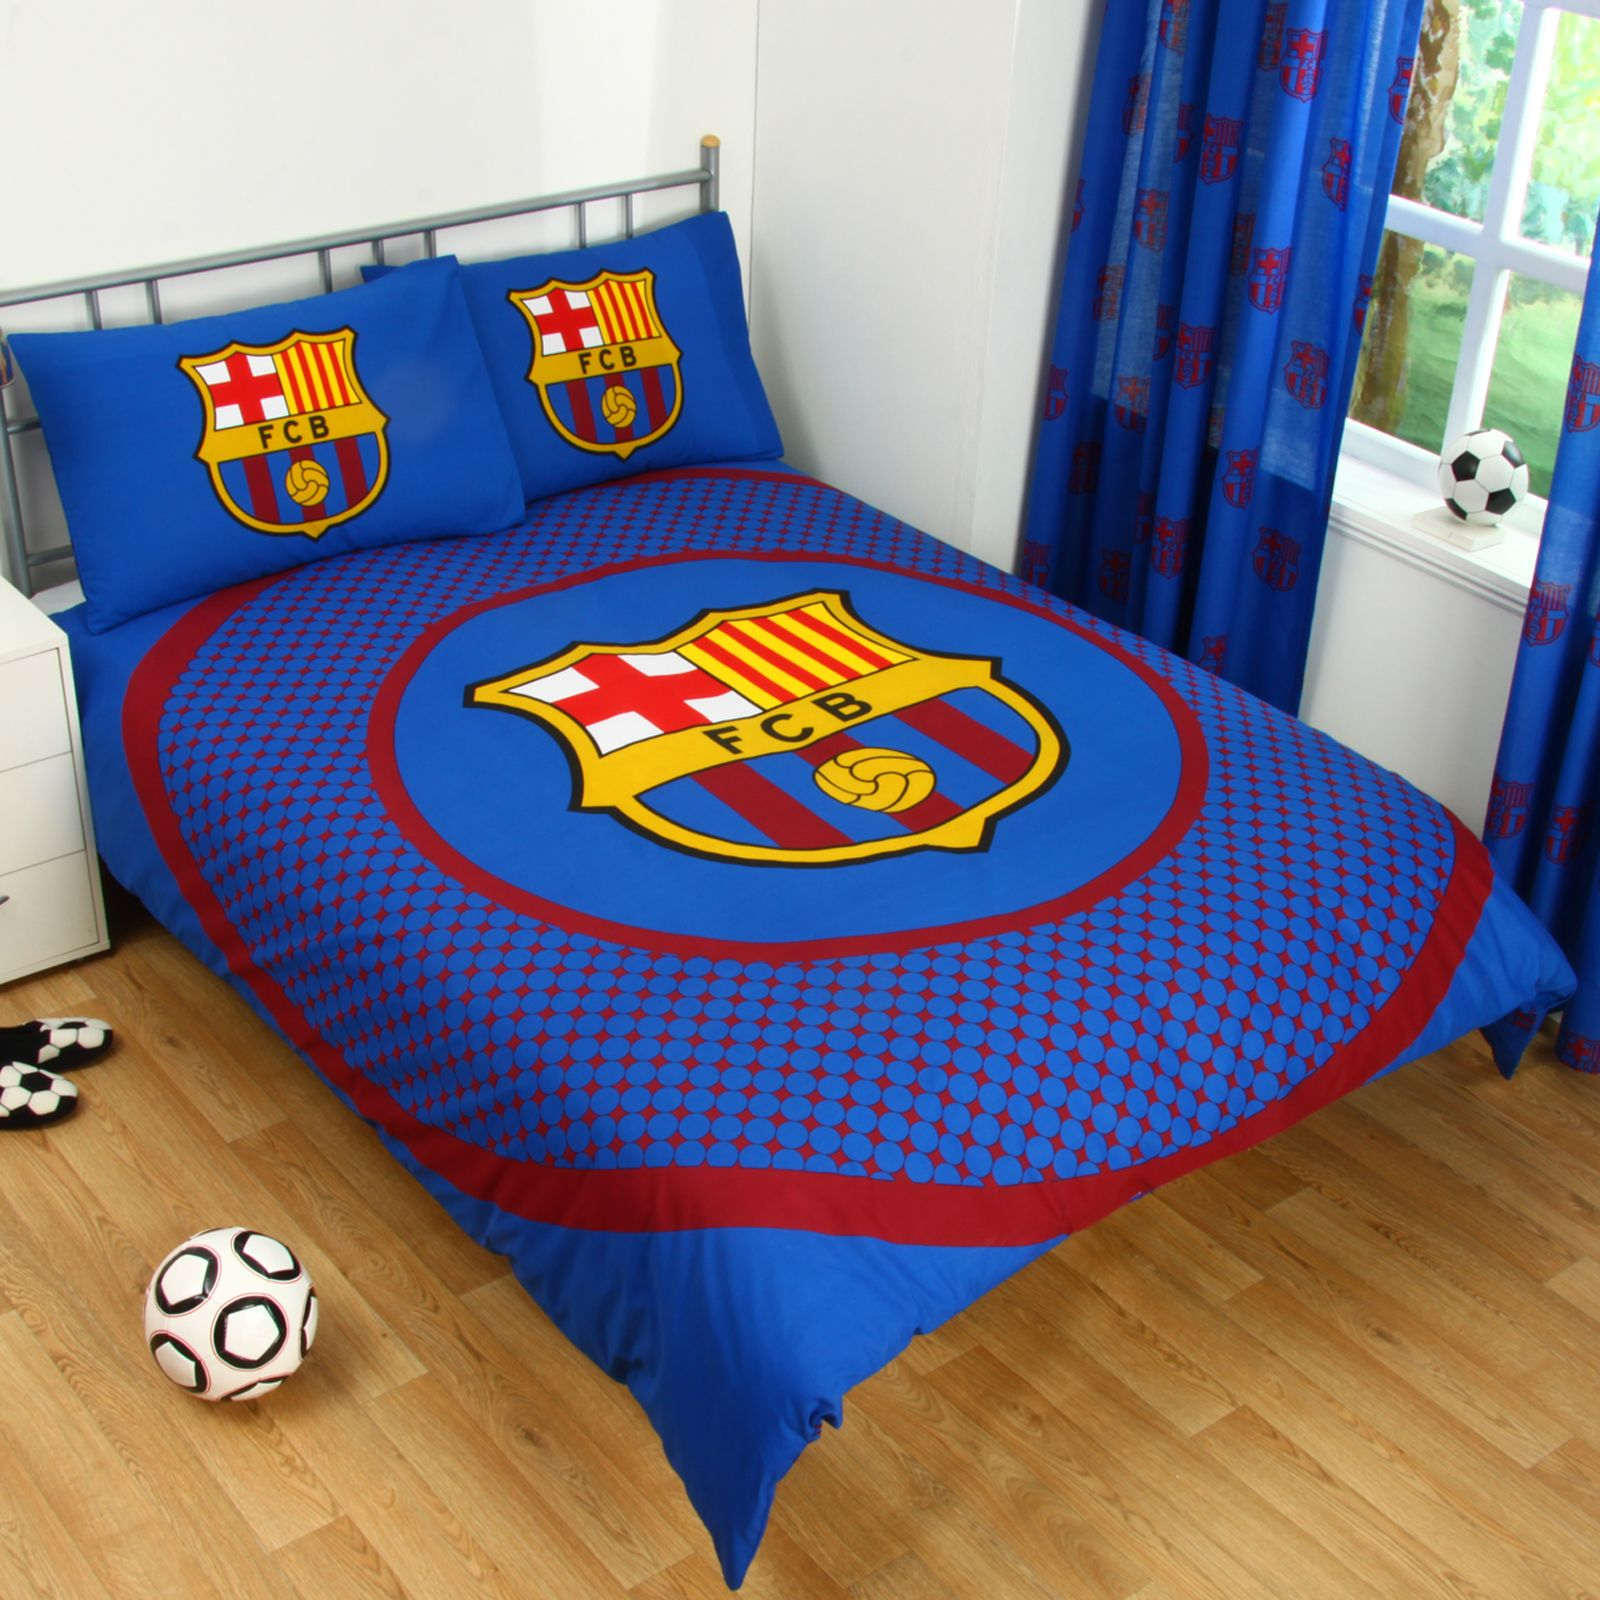 BARCELONA BEDDING AND BEDROOM ACCESSORIES BOYS FOOTBALL NEW EBay - Kids football room